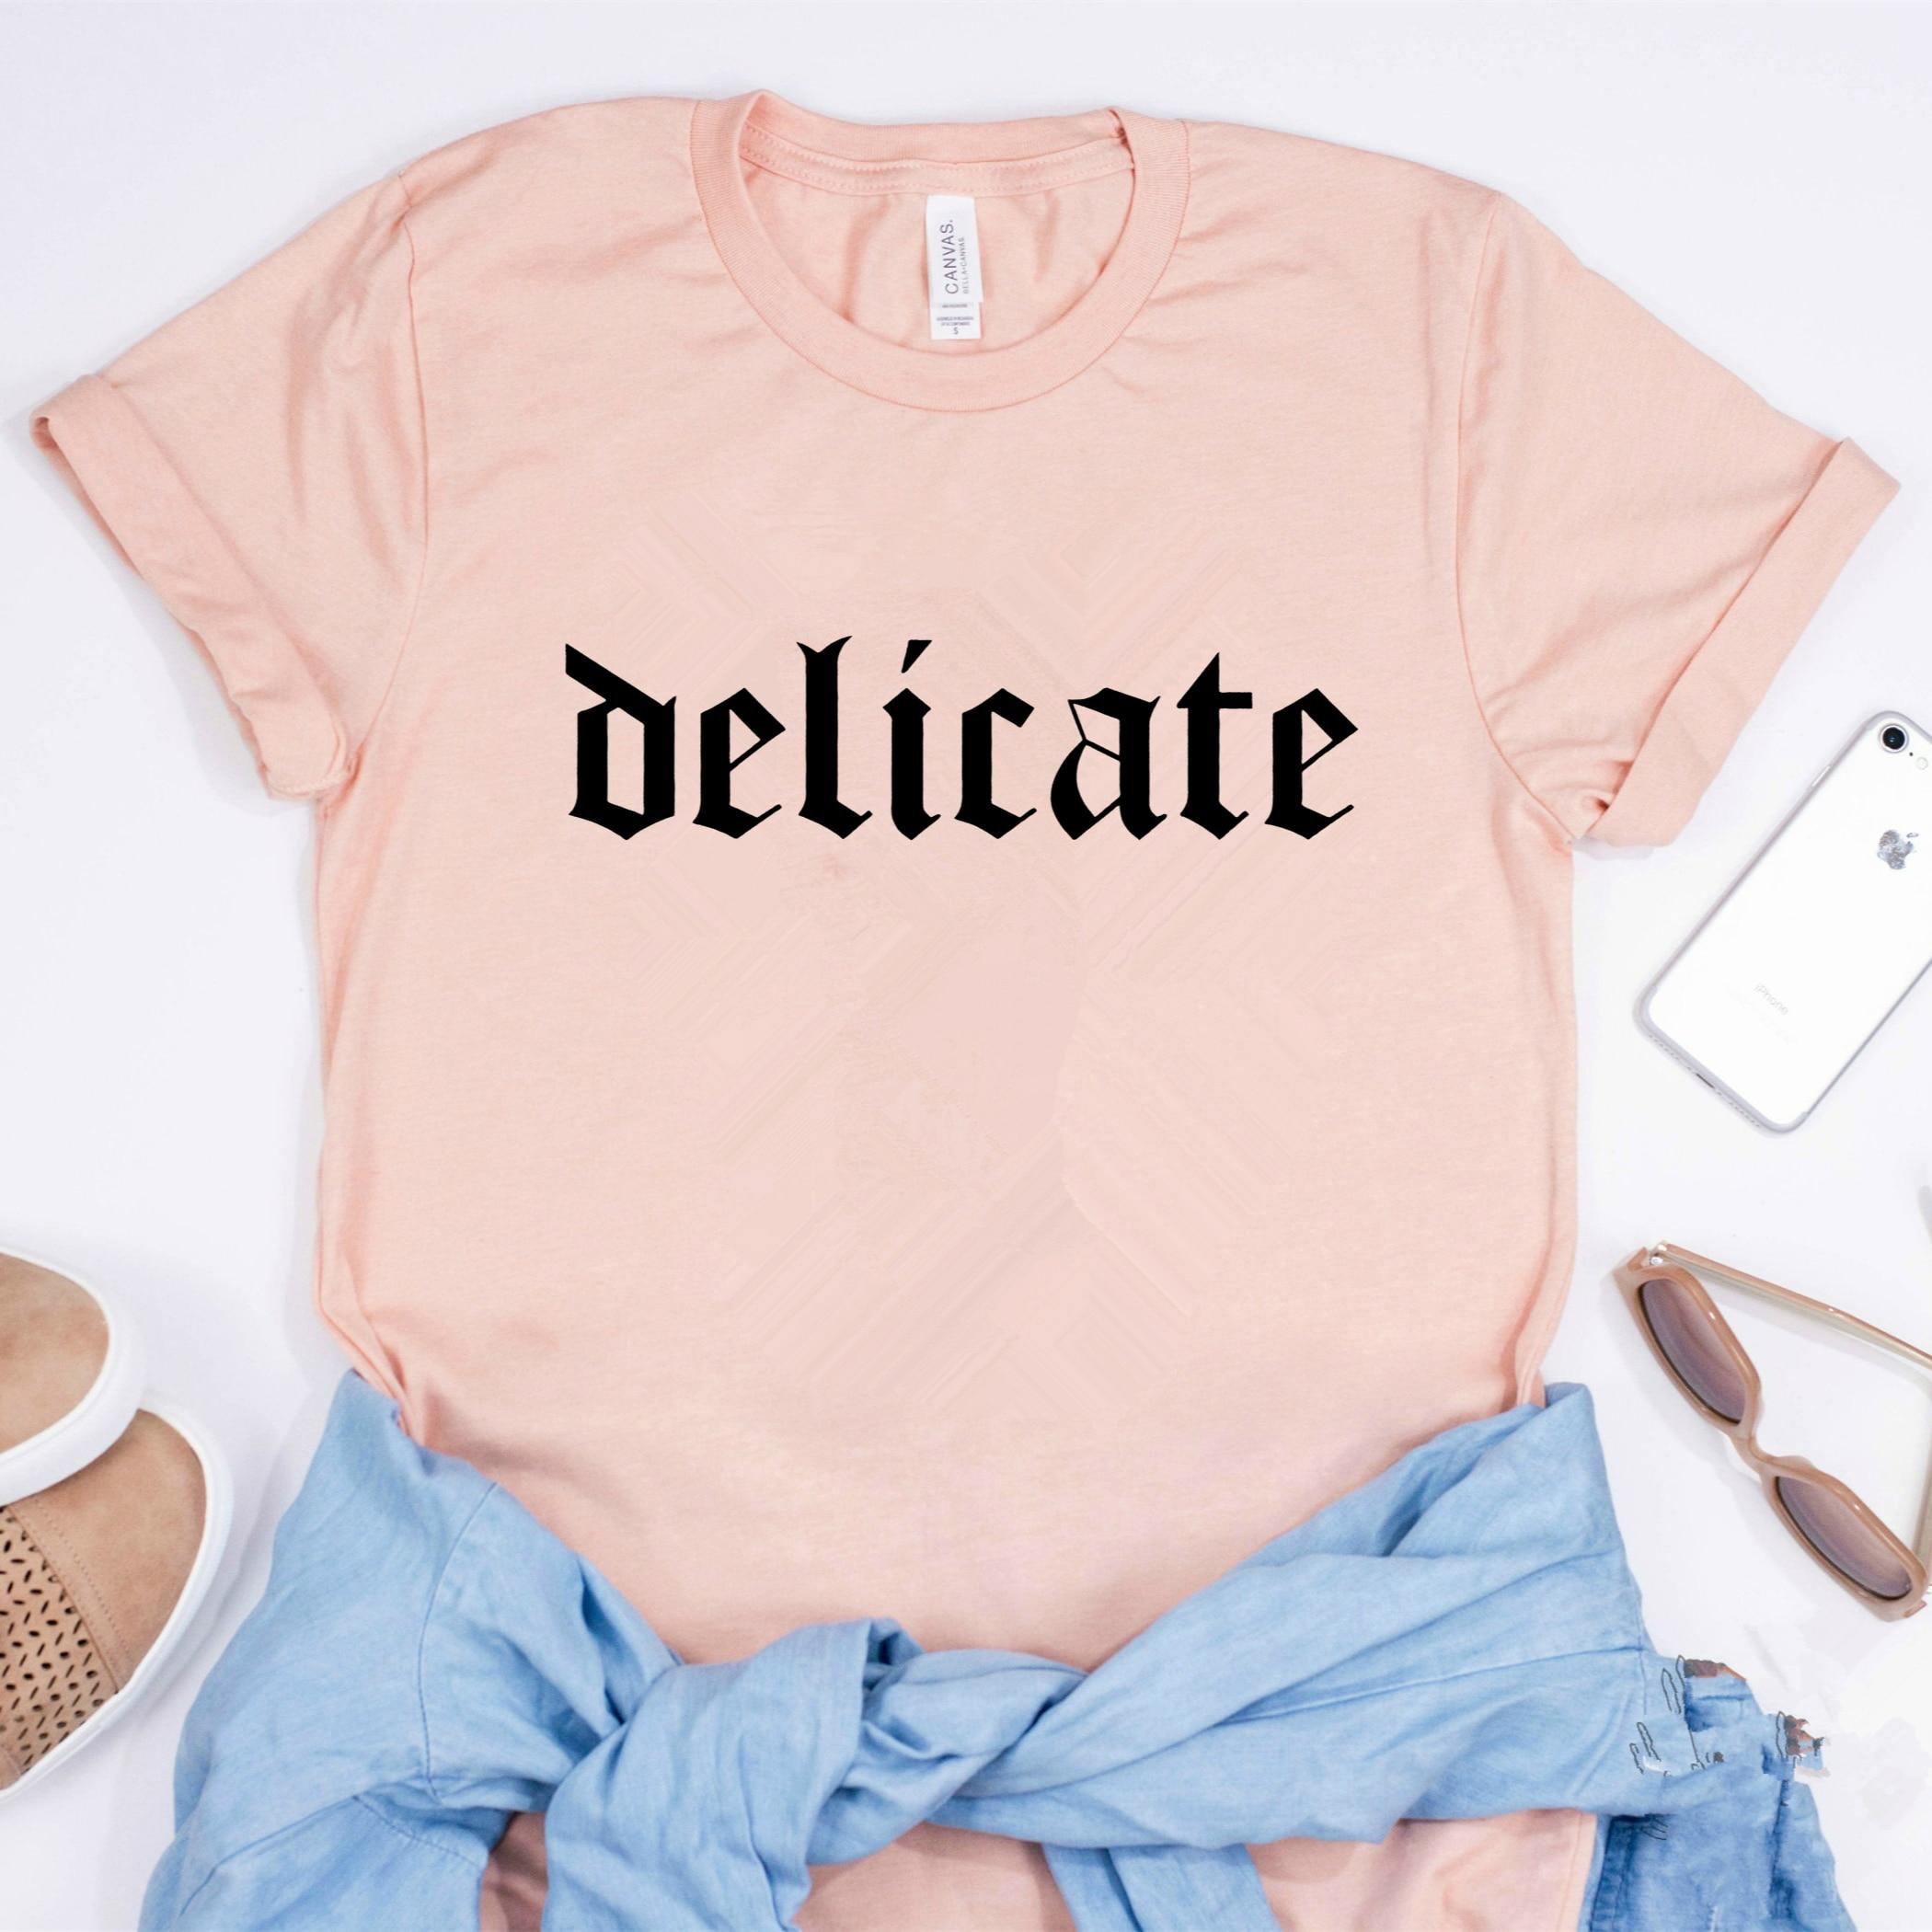 2020 New Taylor Rep Shirt Delicate Lyrics Shirt Taylor Tank T Swift Taylor Big Rep T-shirt Unisex T-shirt